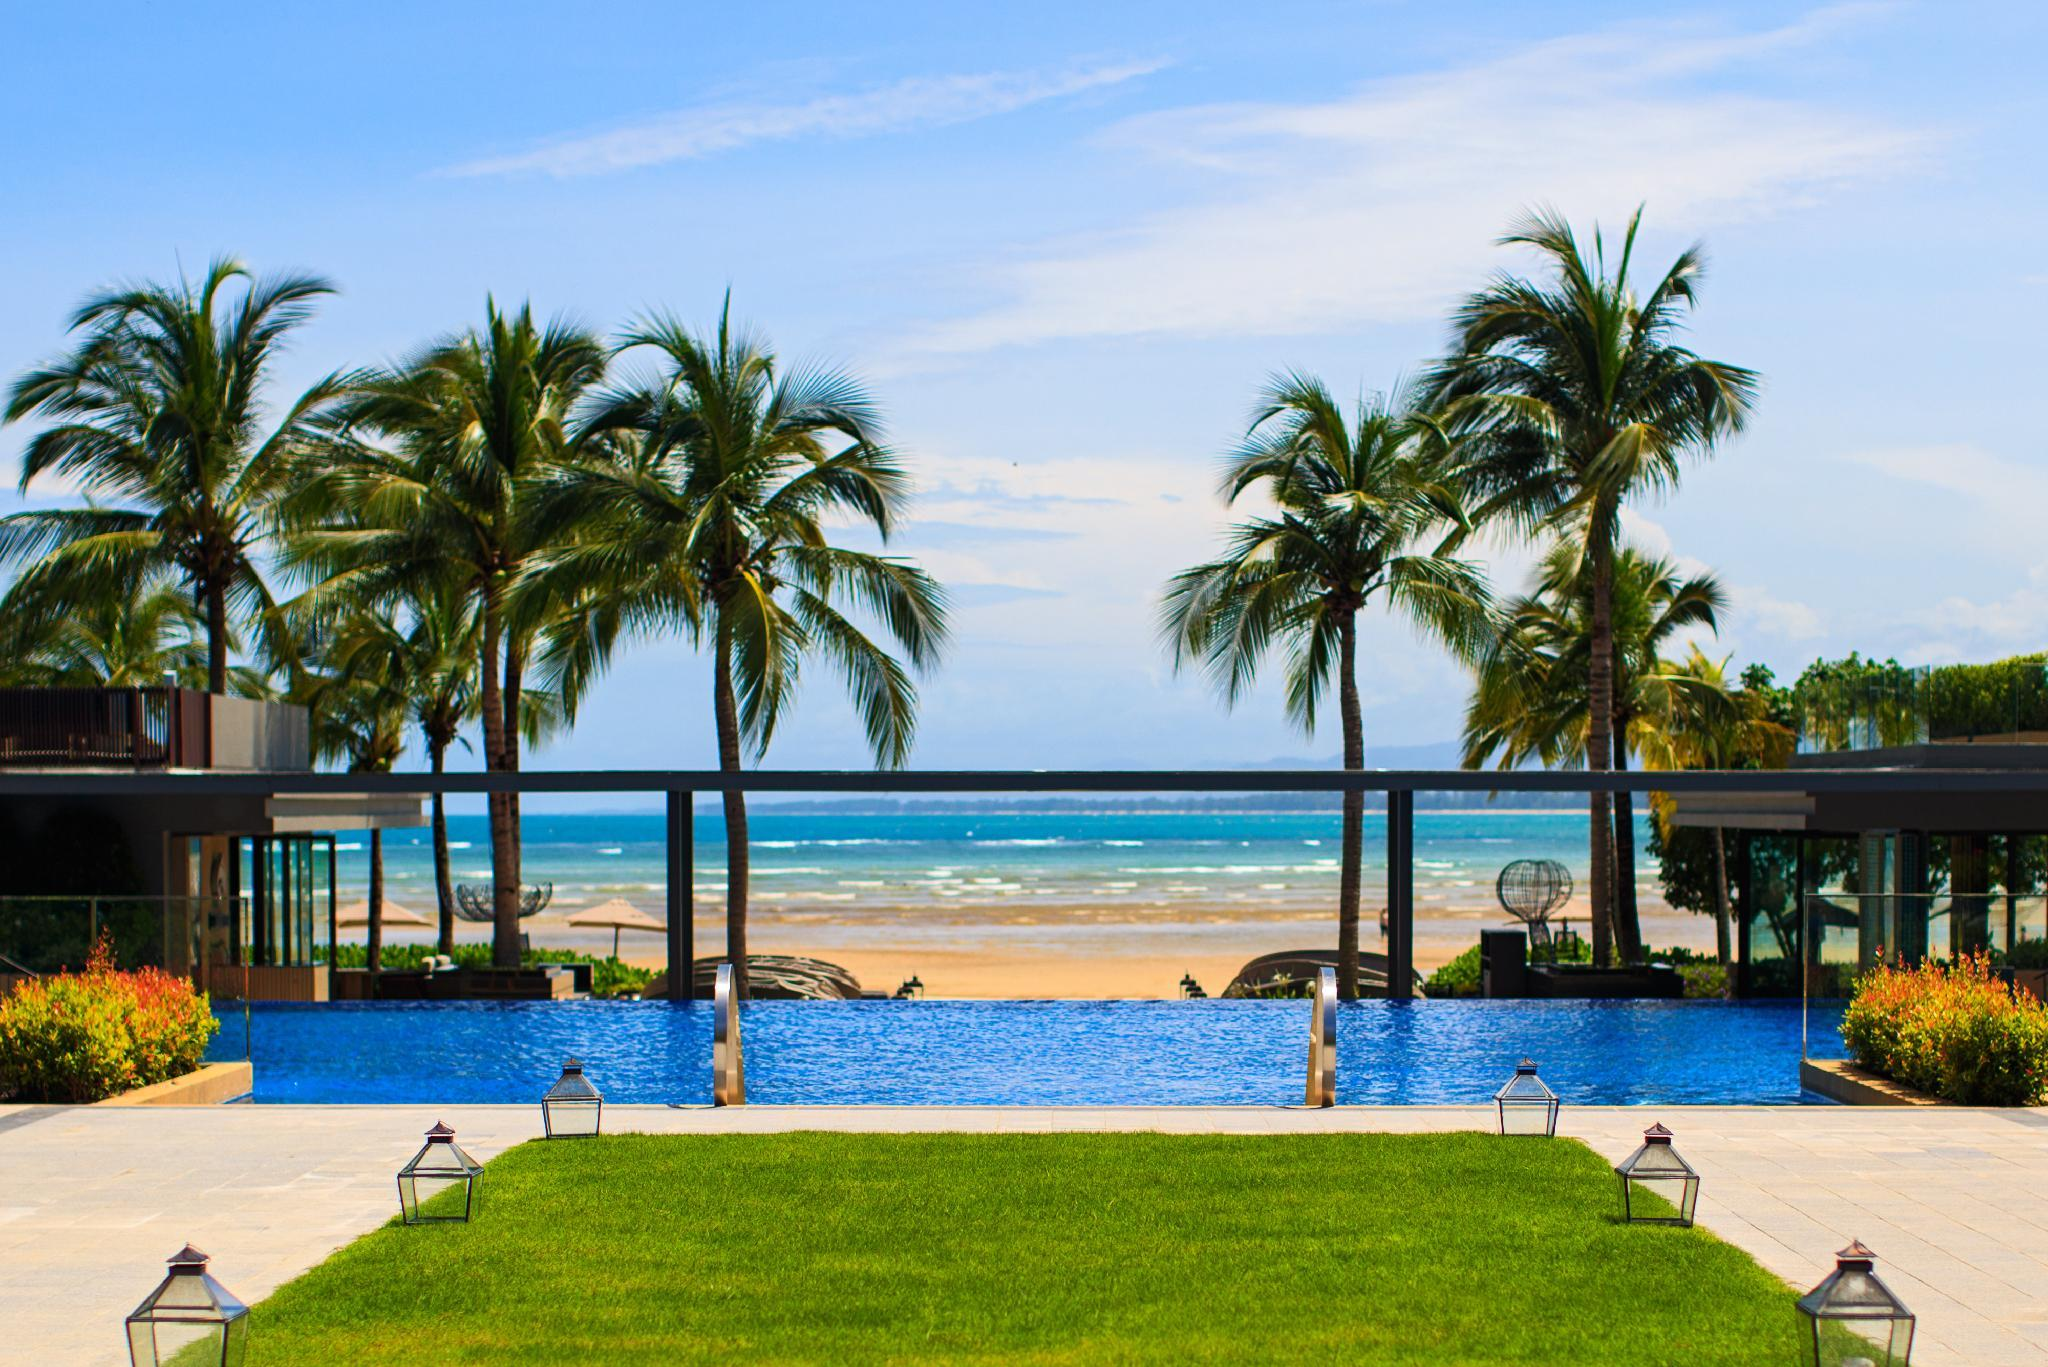 Phuket Marriott Resort And Spa Nai Yang Beach Thailand